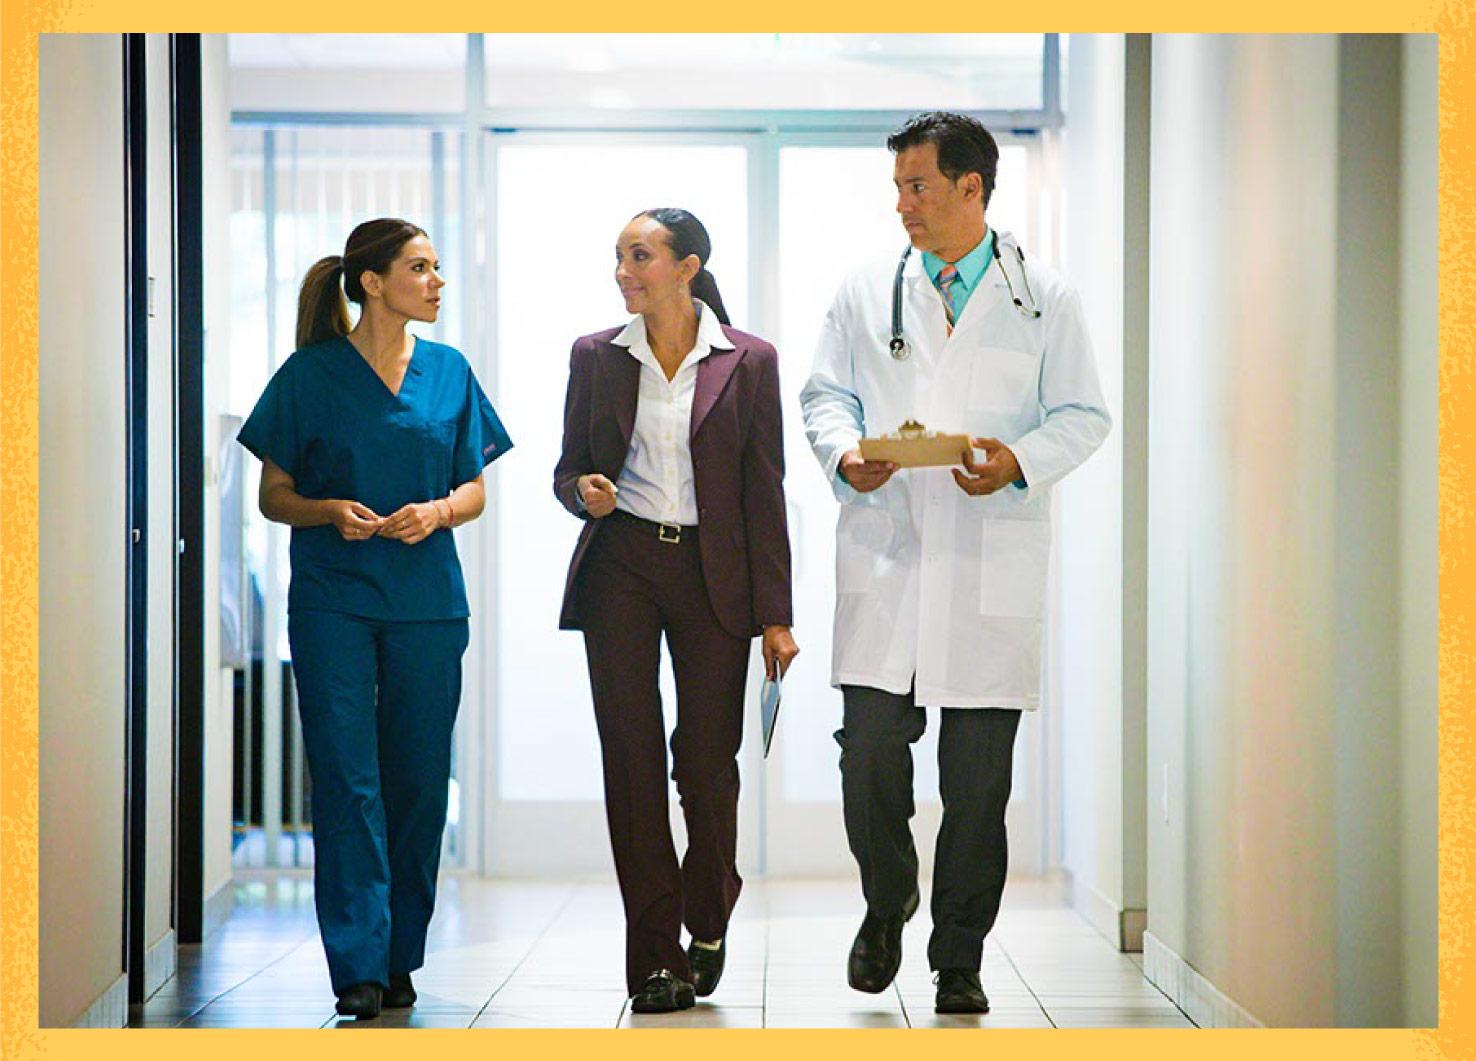 Three medical professionals walking down hallway talking